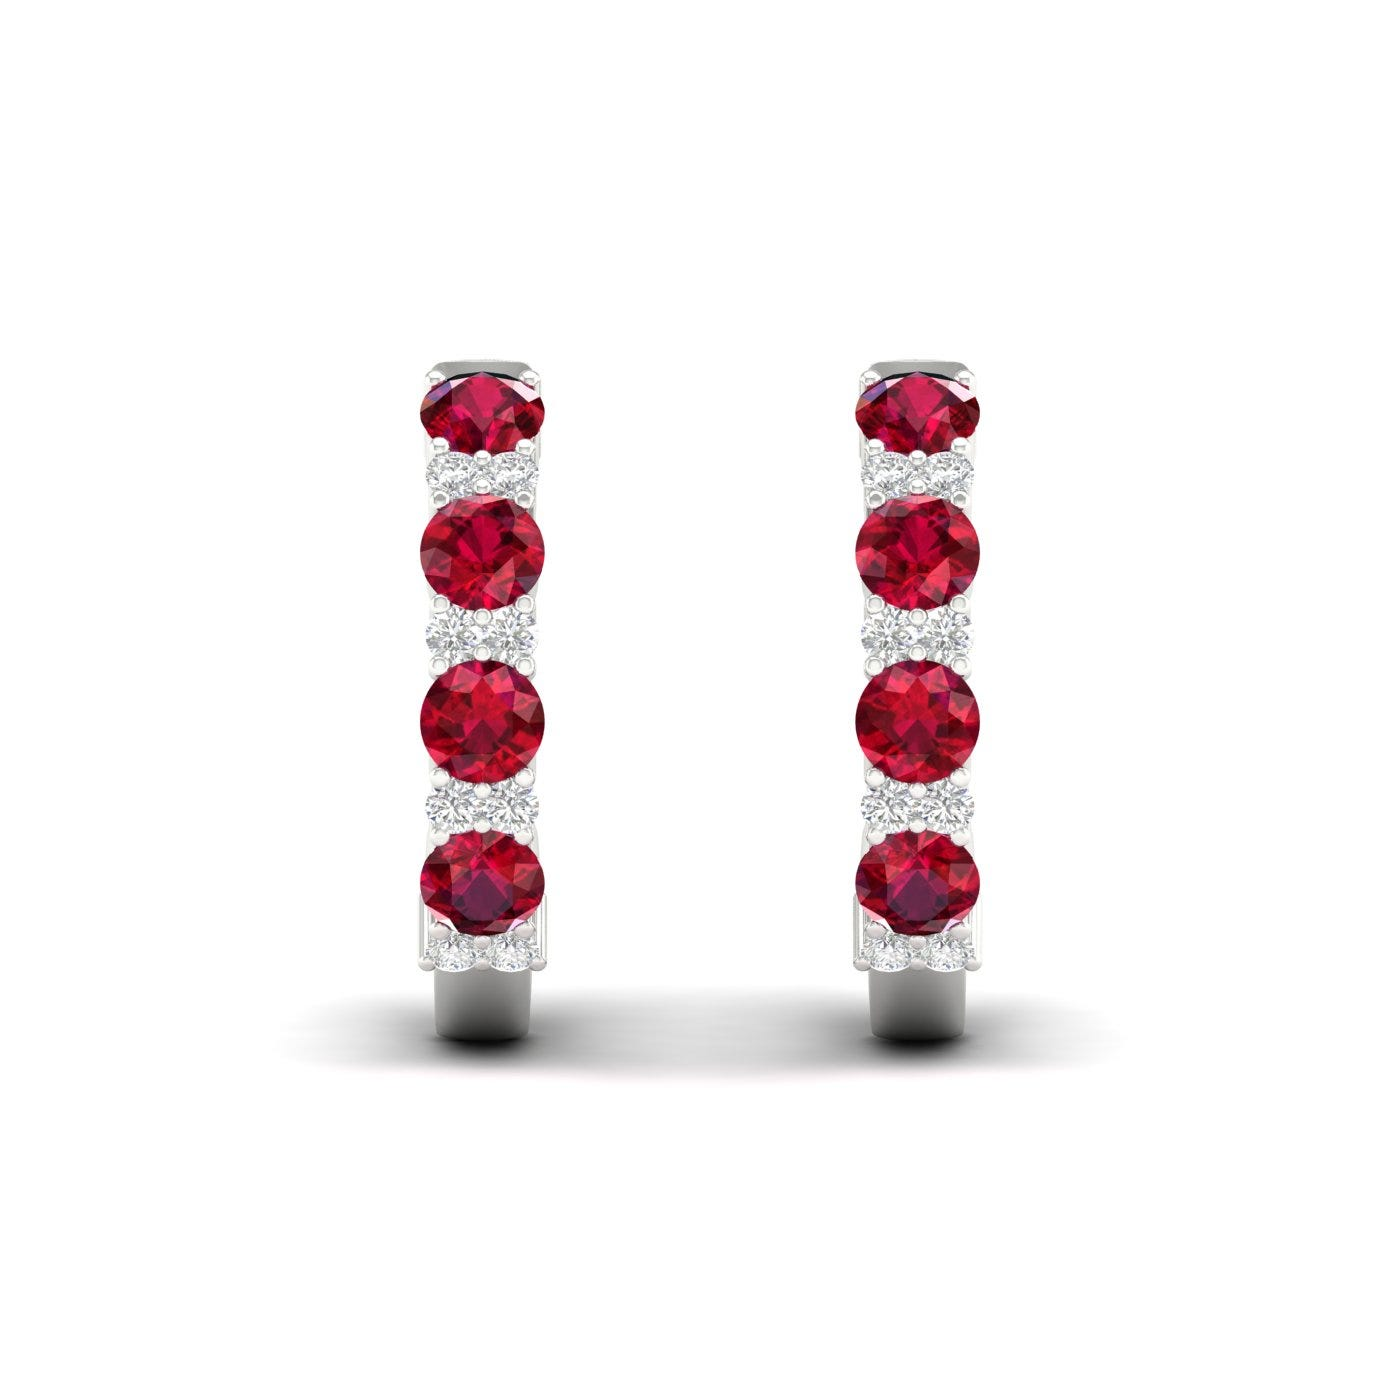 Ruby & Diamond Hoop Earrings in 10k White Gold